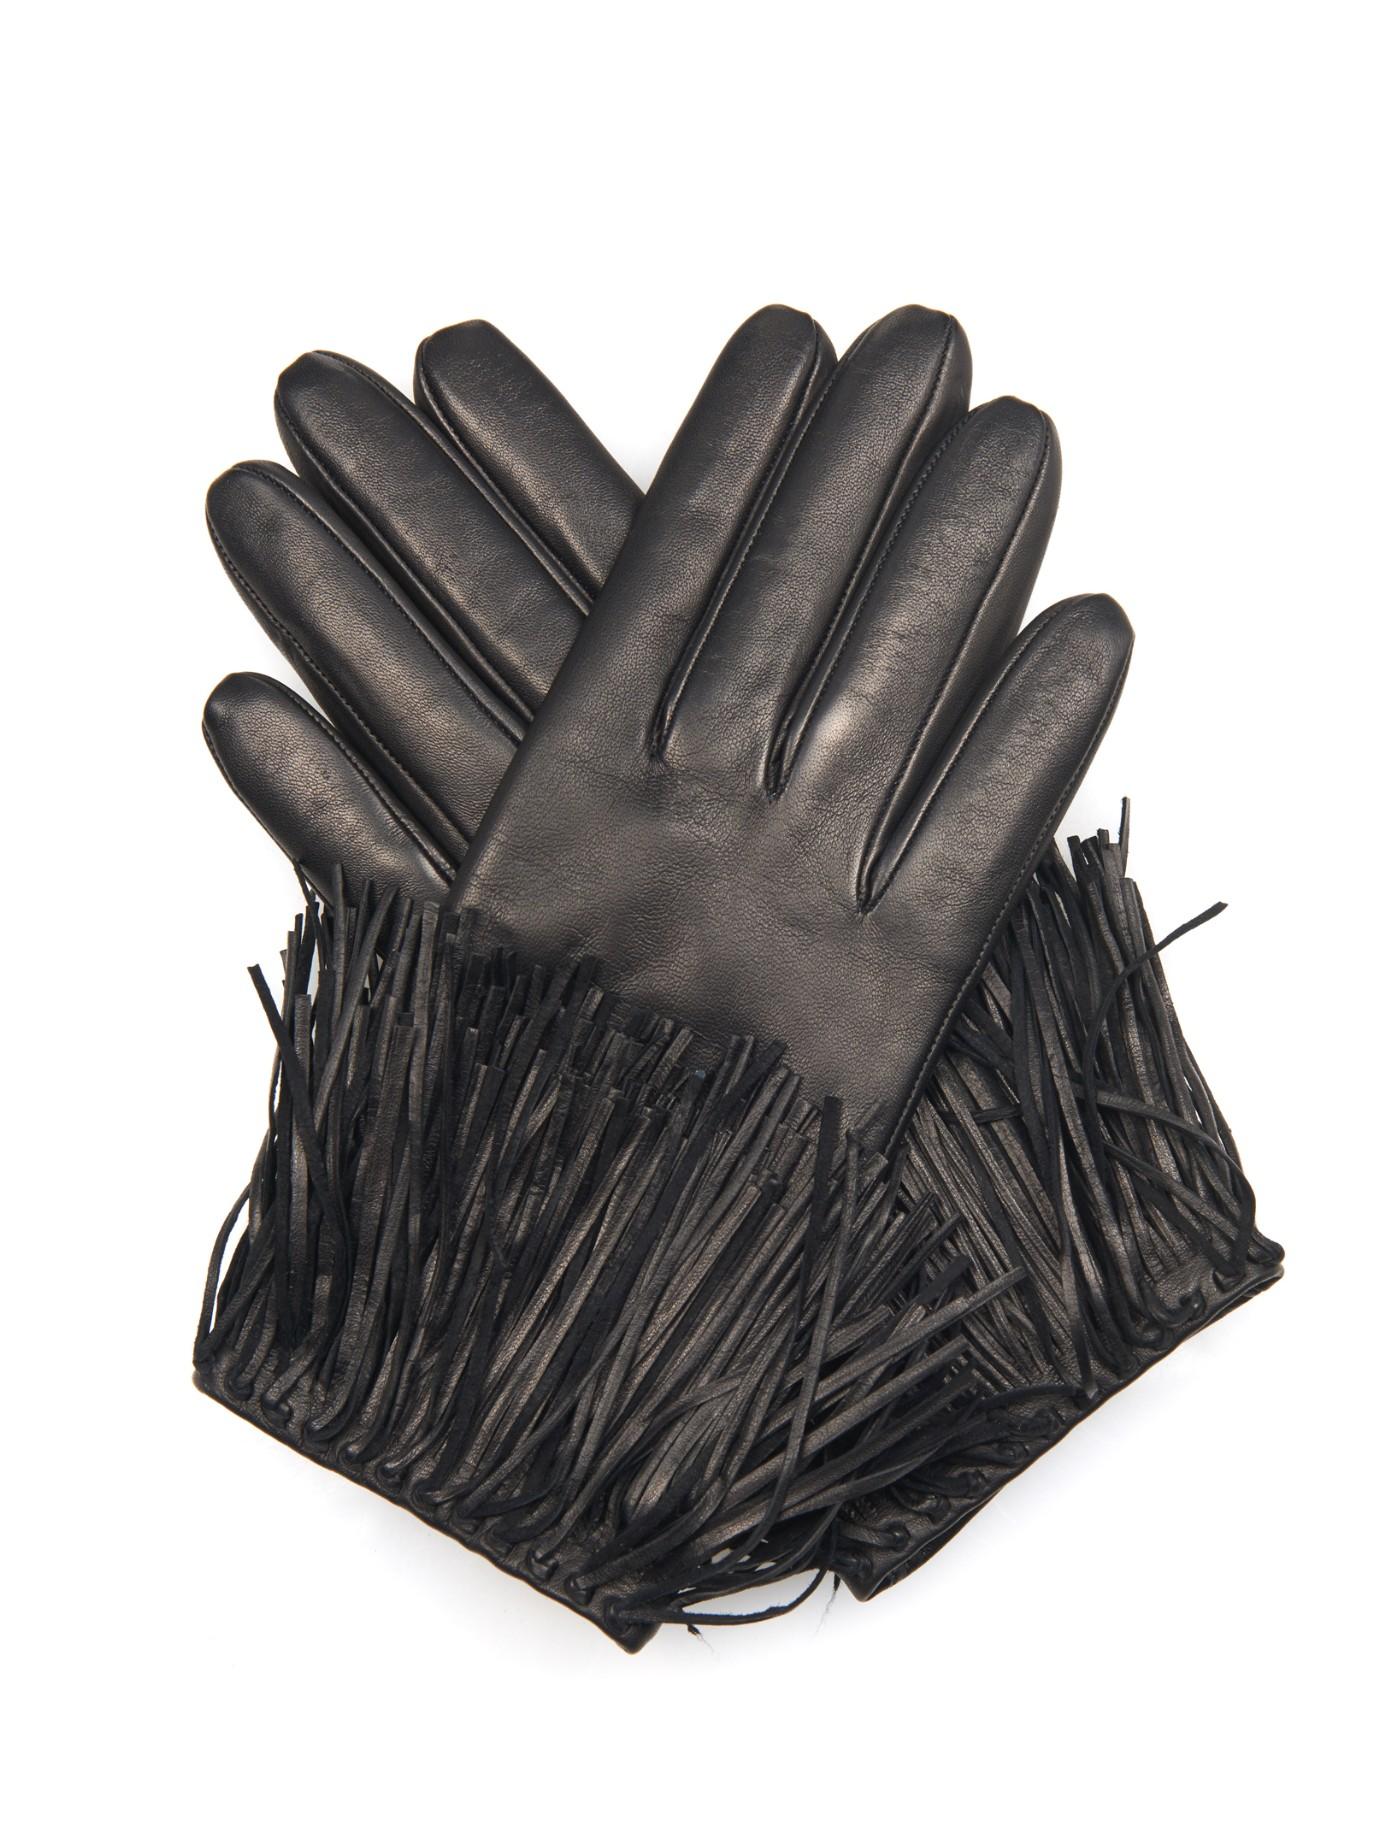 Lyst - Diane von Furstenberg Fringe Leather Gloves in Black 5e2c7845483e